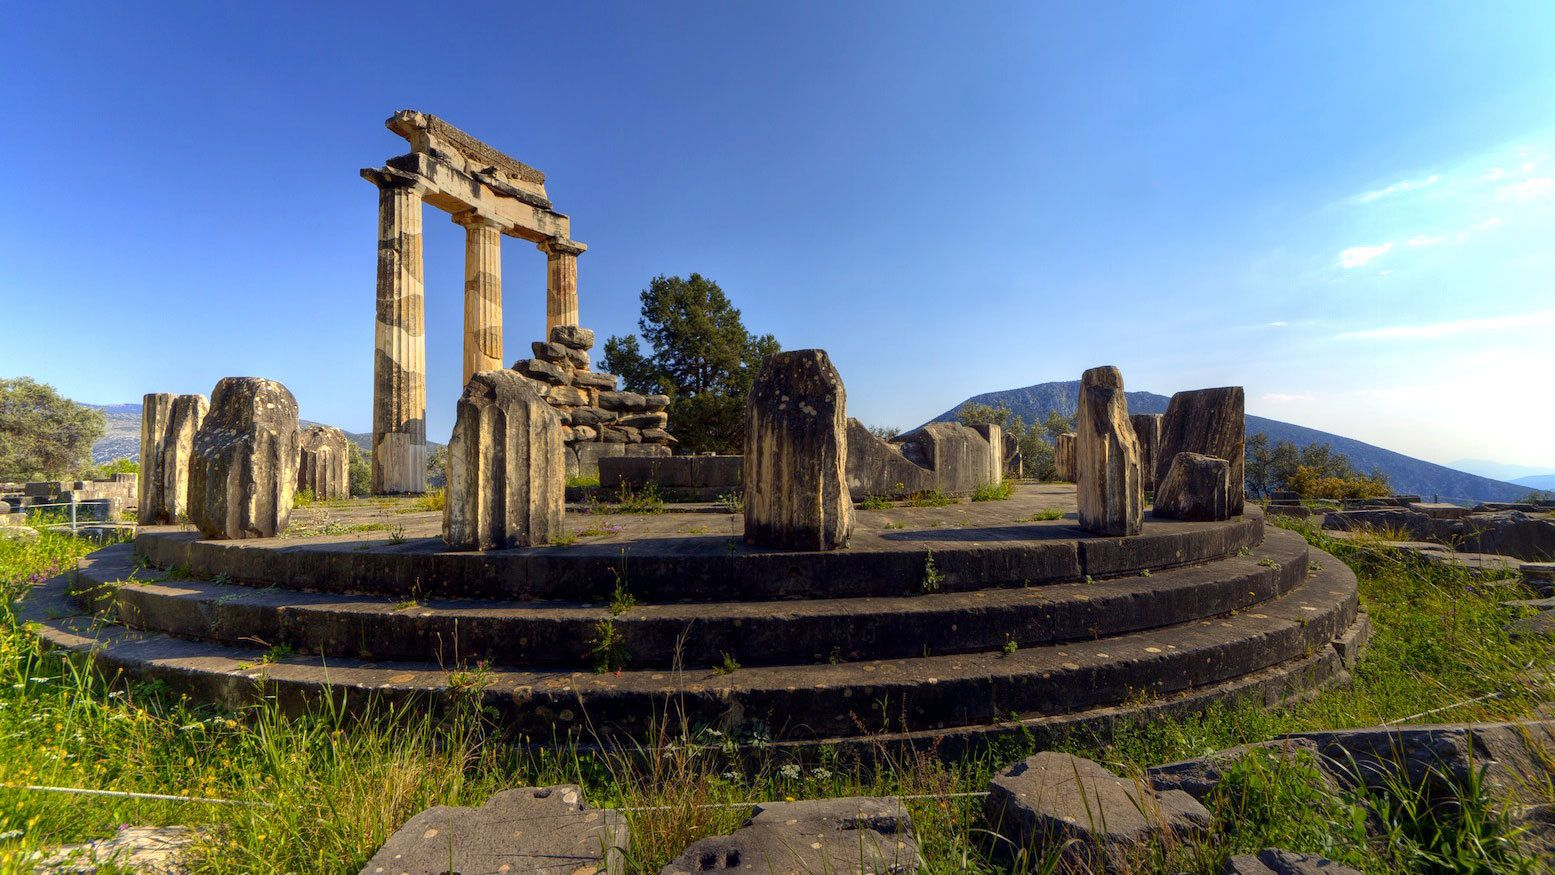 Circular ruins of the sanctuary of Athena Pronoia at Delphi